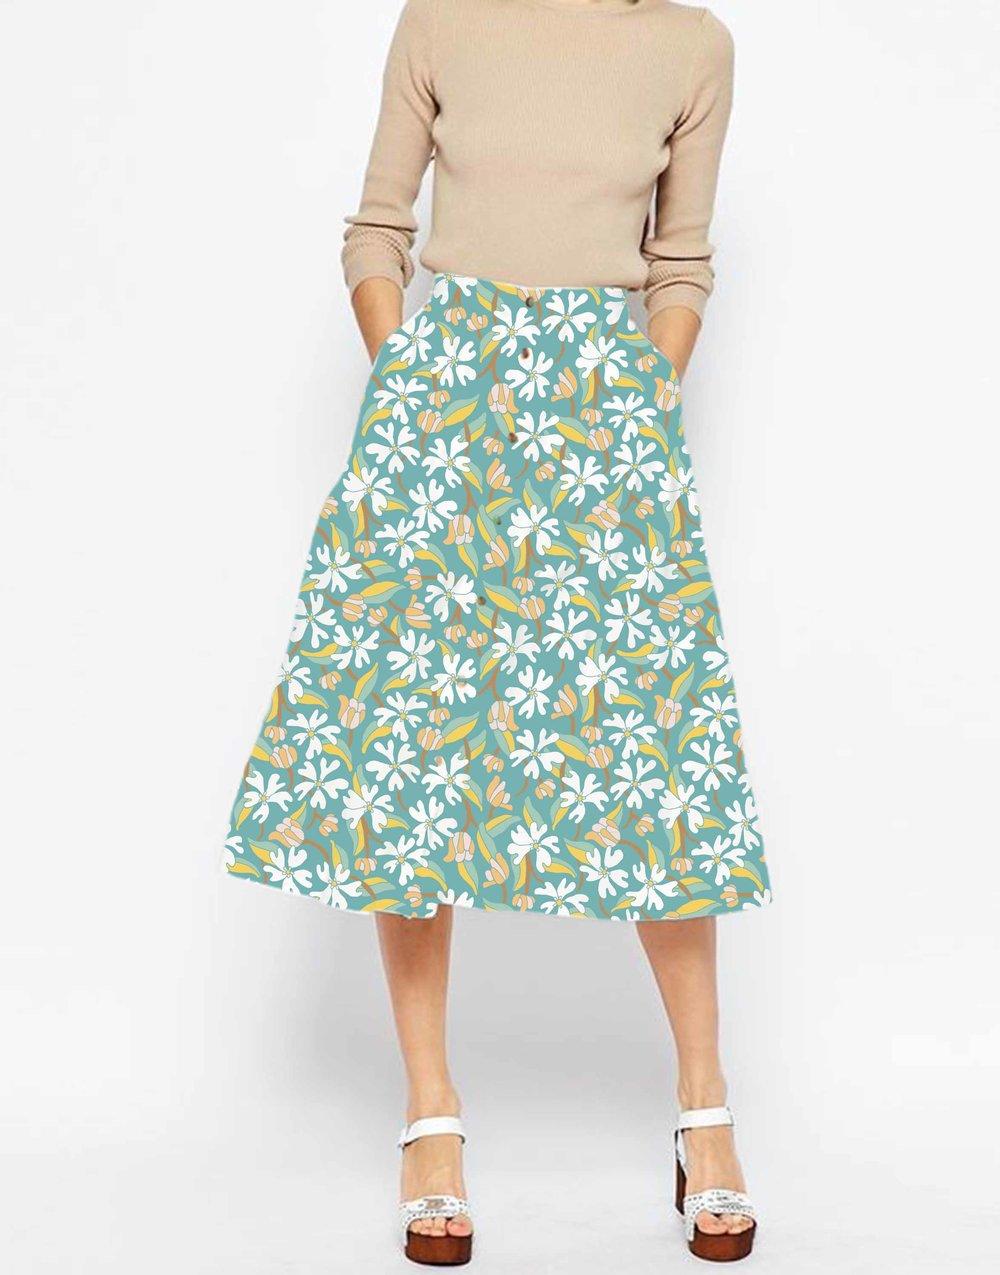 Skirt Mockup by Jessie Tyree Jenness